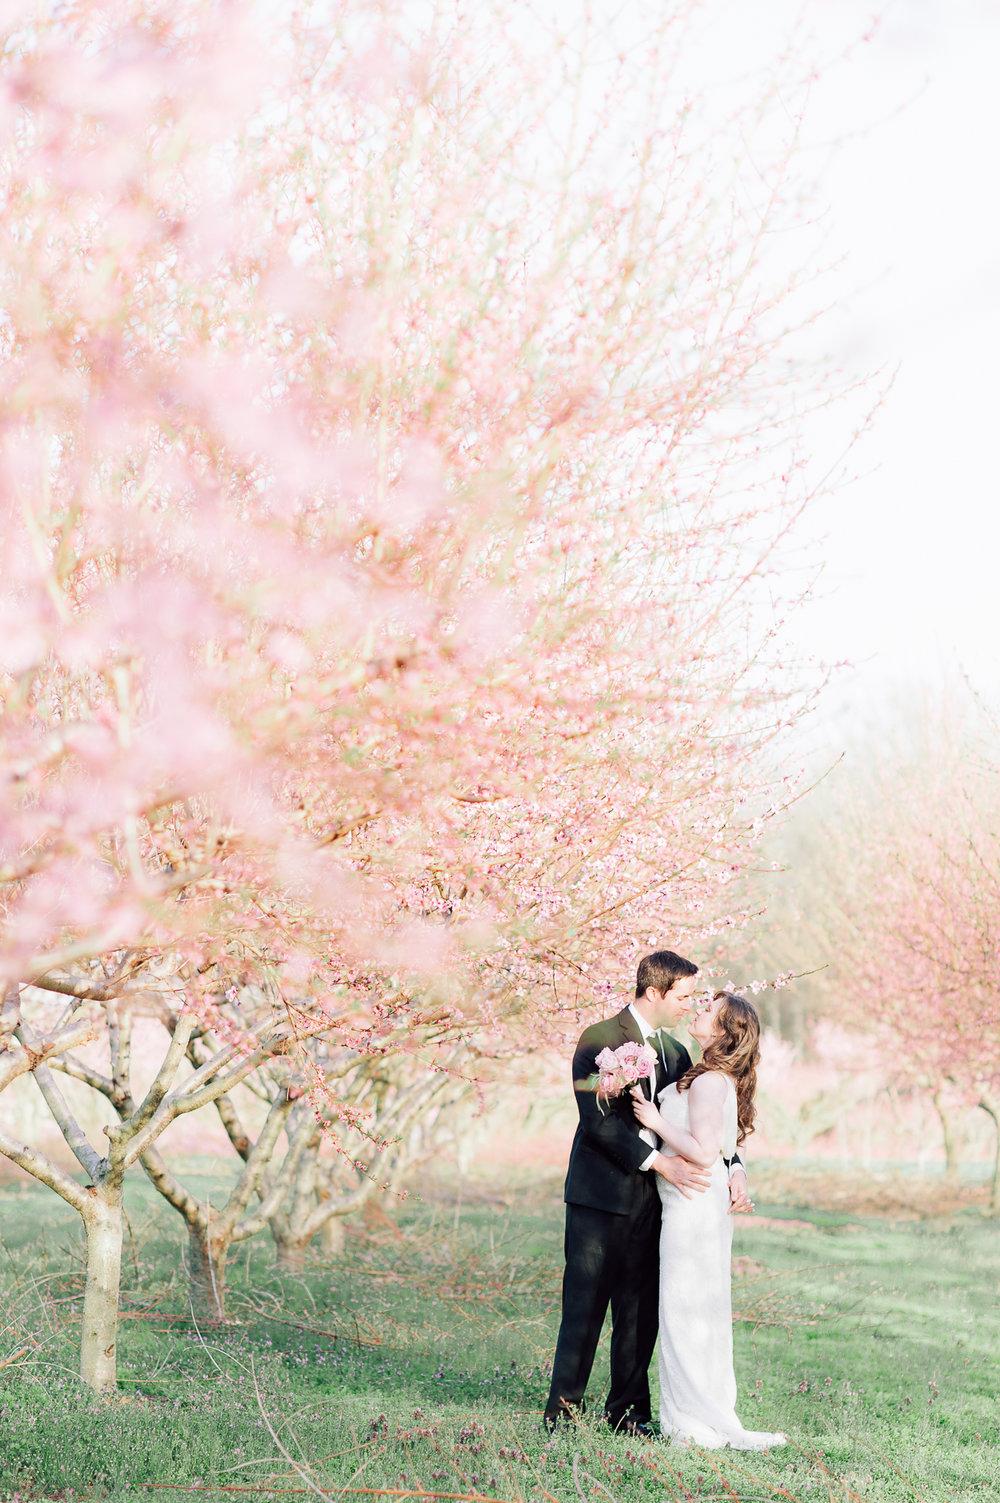 springwedding_cherryblossoms_virginiaphotographer_youseephotography_styledshoot (580).jpg